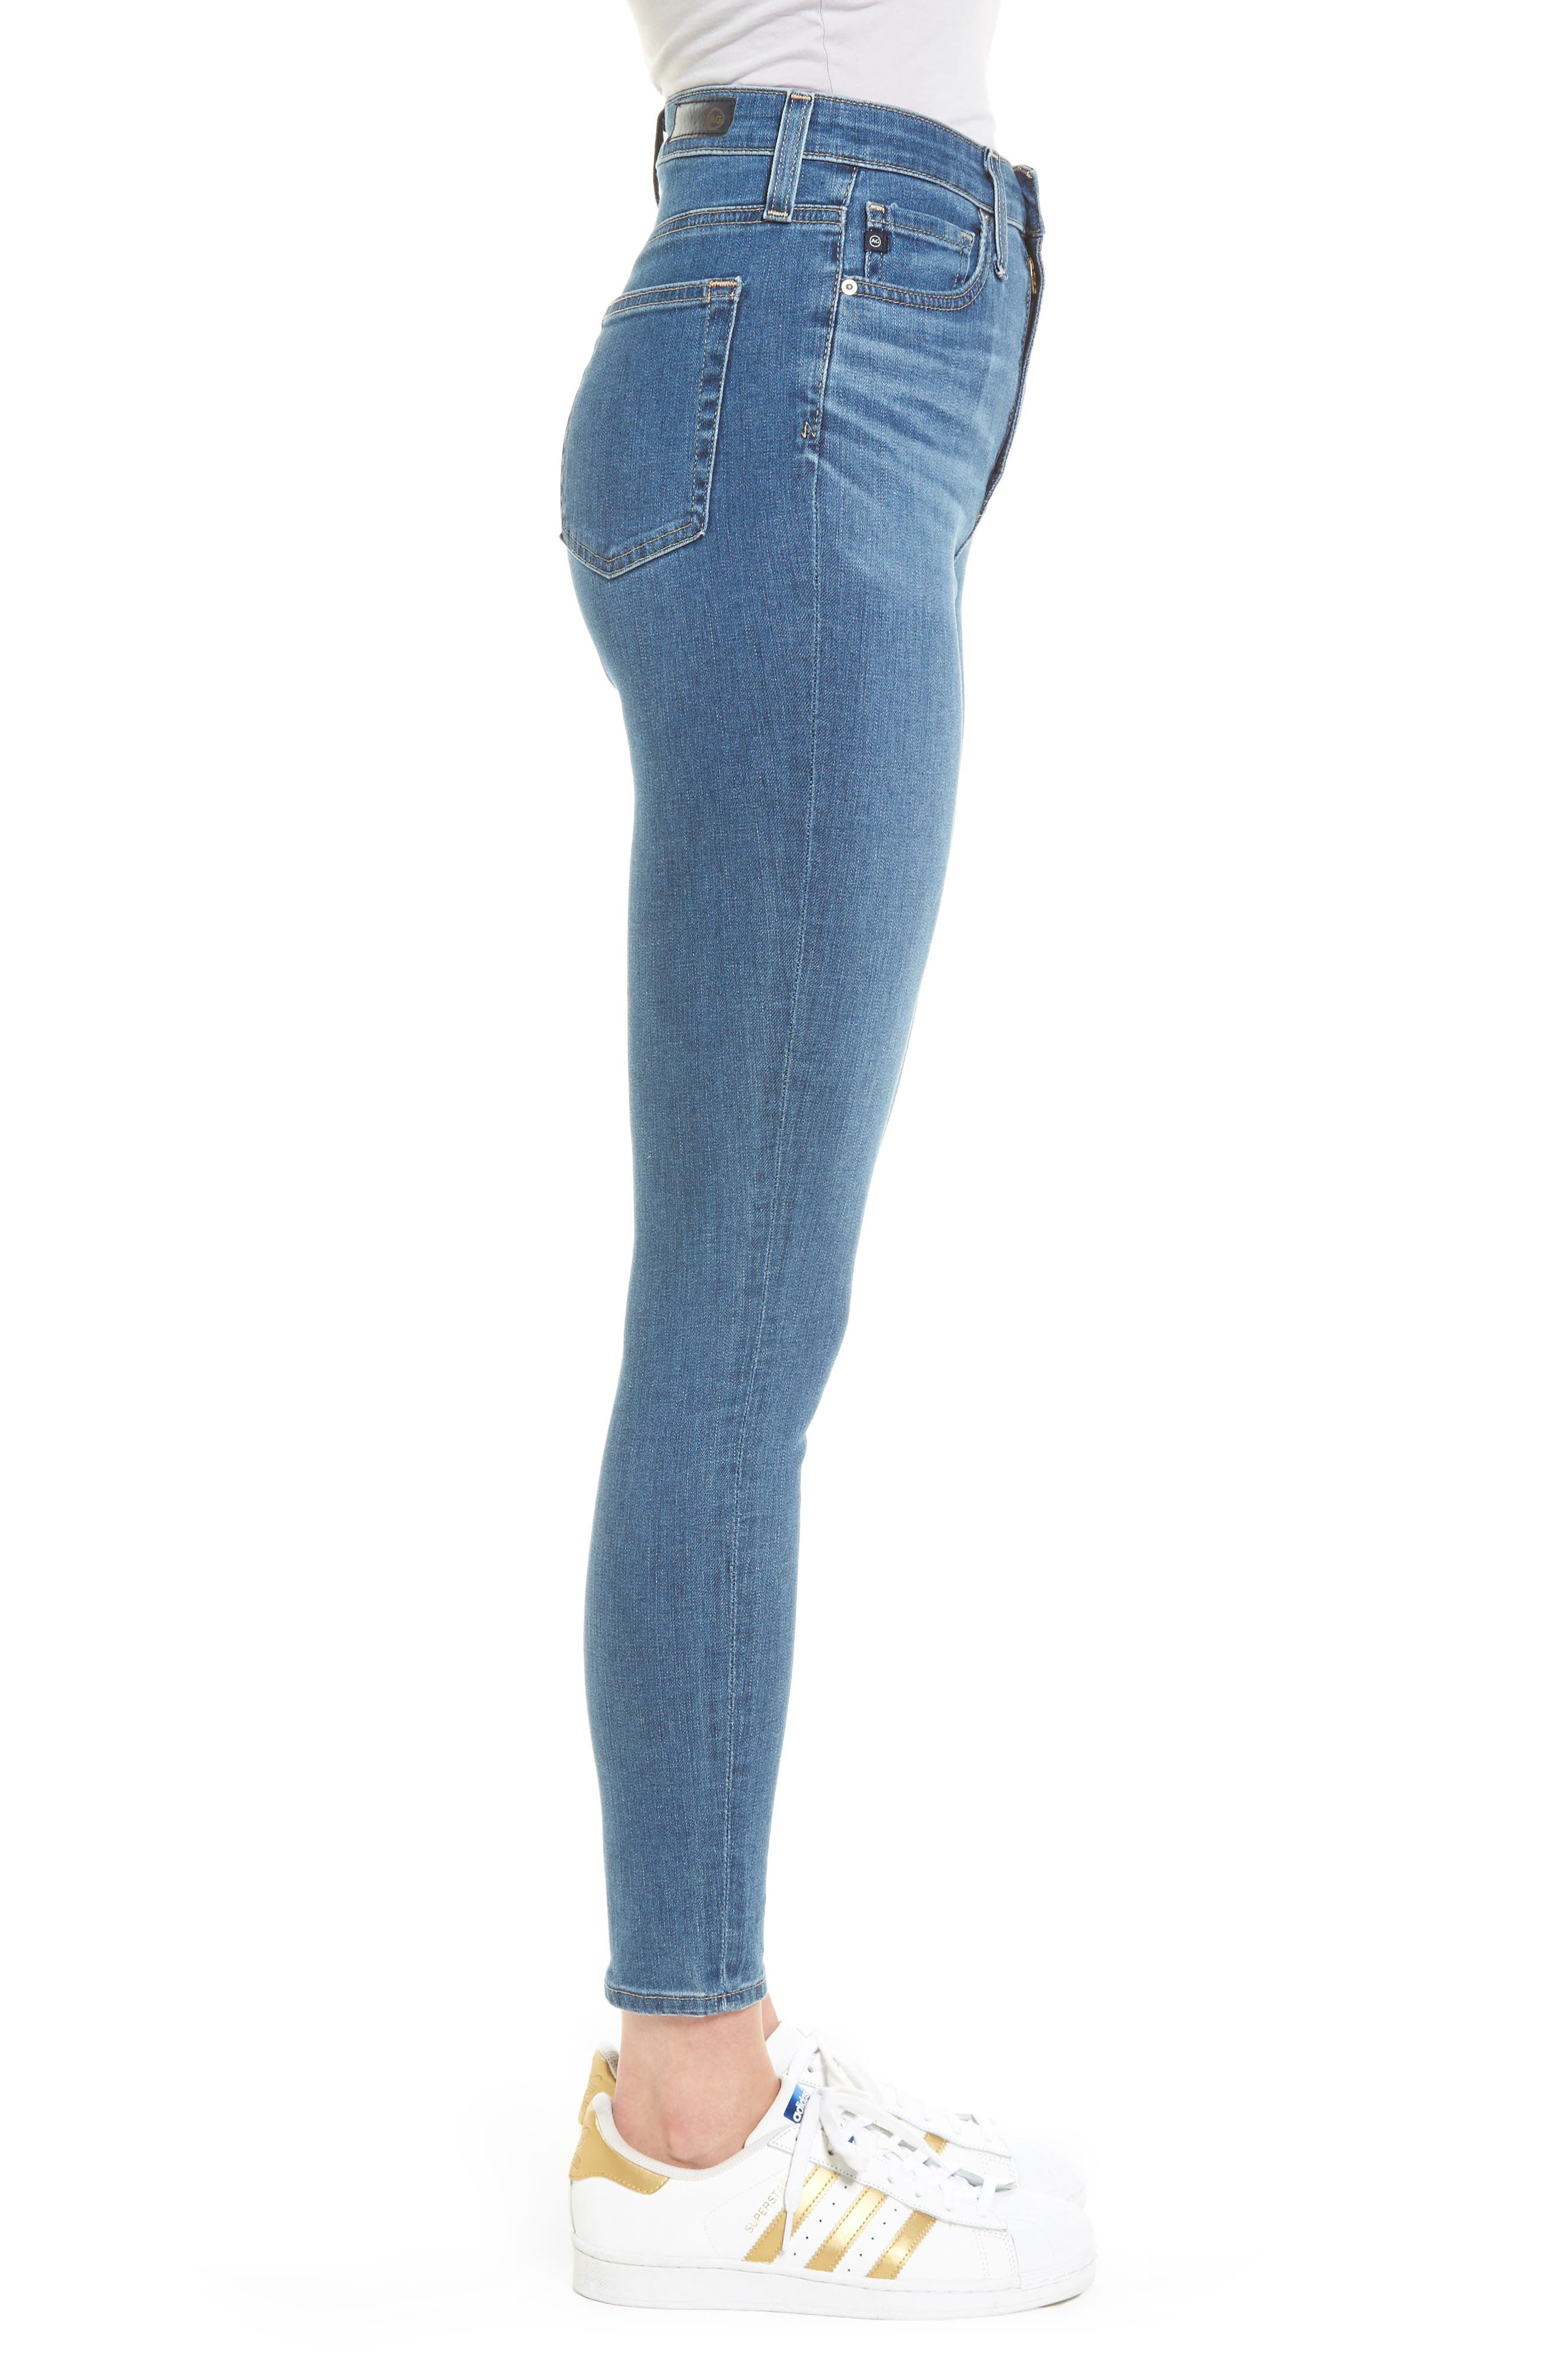 Mila High Waist Ankle Skinny Jeans,                             Alternate thumbnail 3, color,                             416